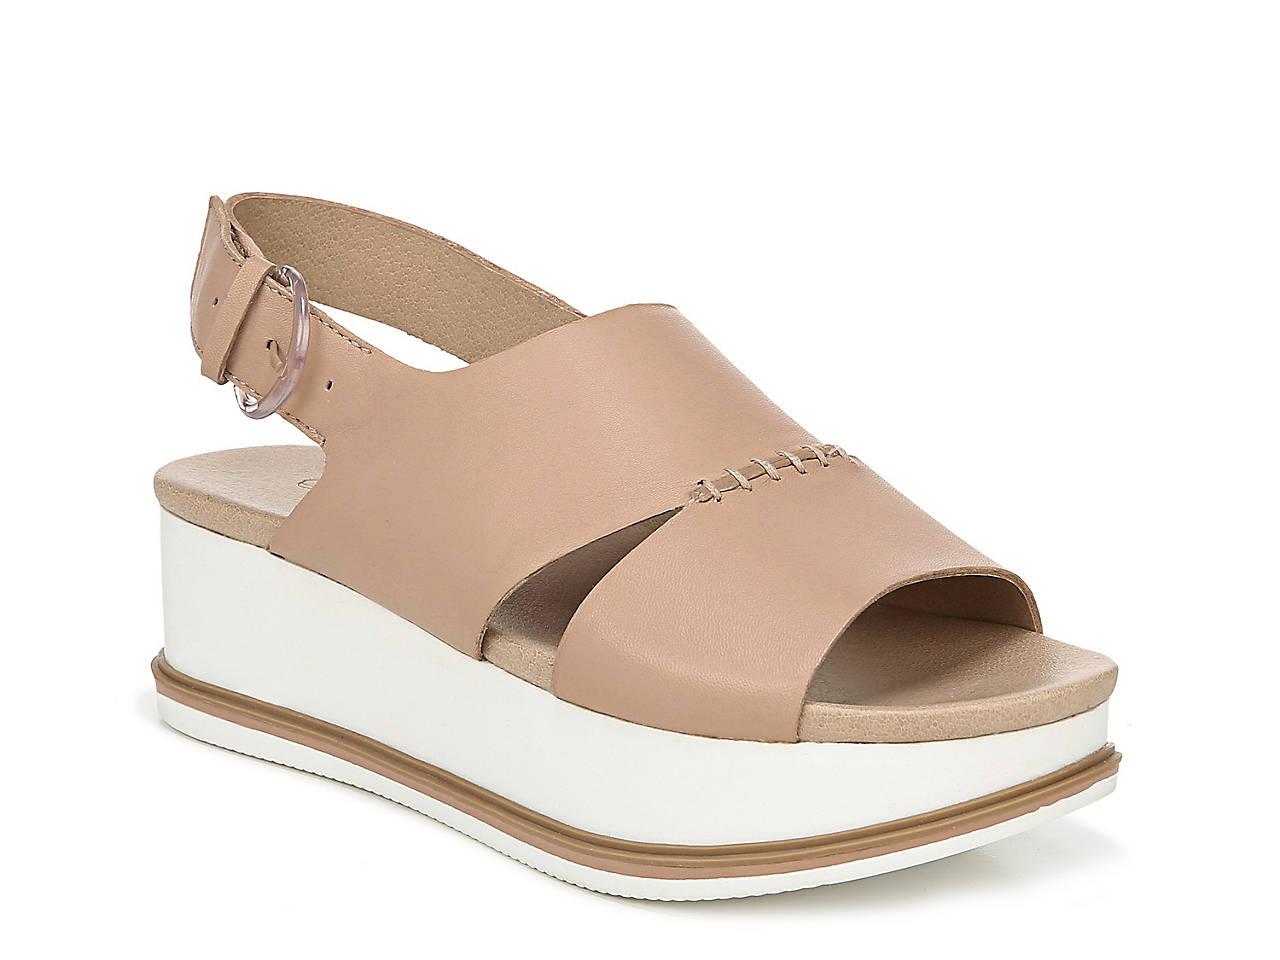 3614bd855a41 Dr. Scholl's Catch Me Wedge Sandal Women's Shoes   DSW